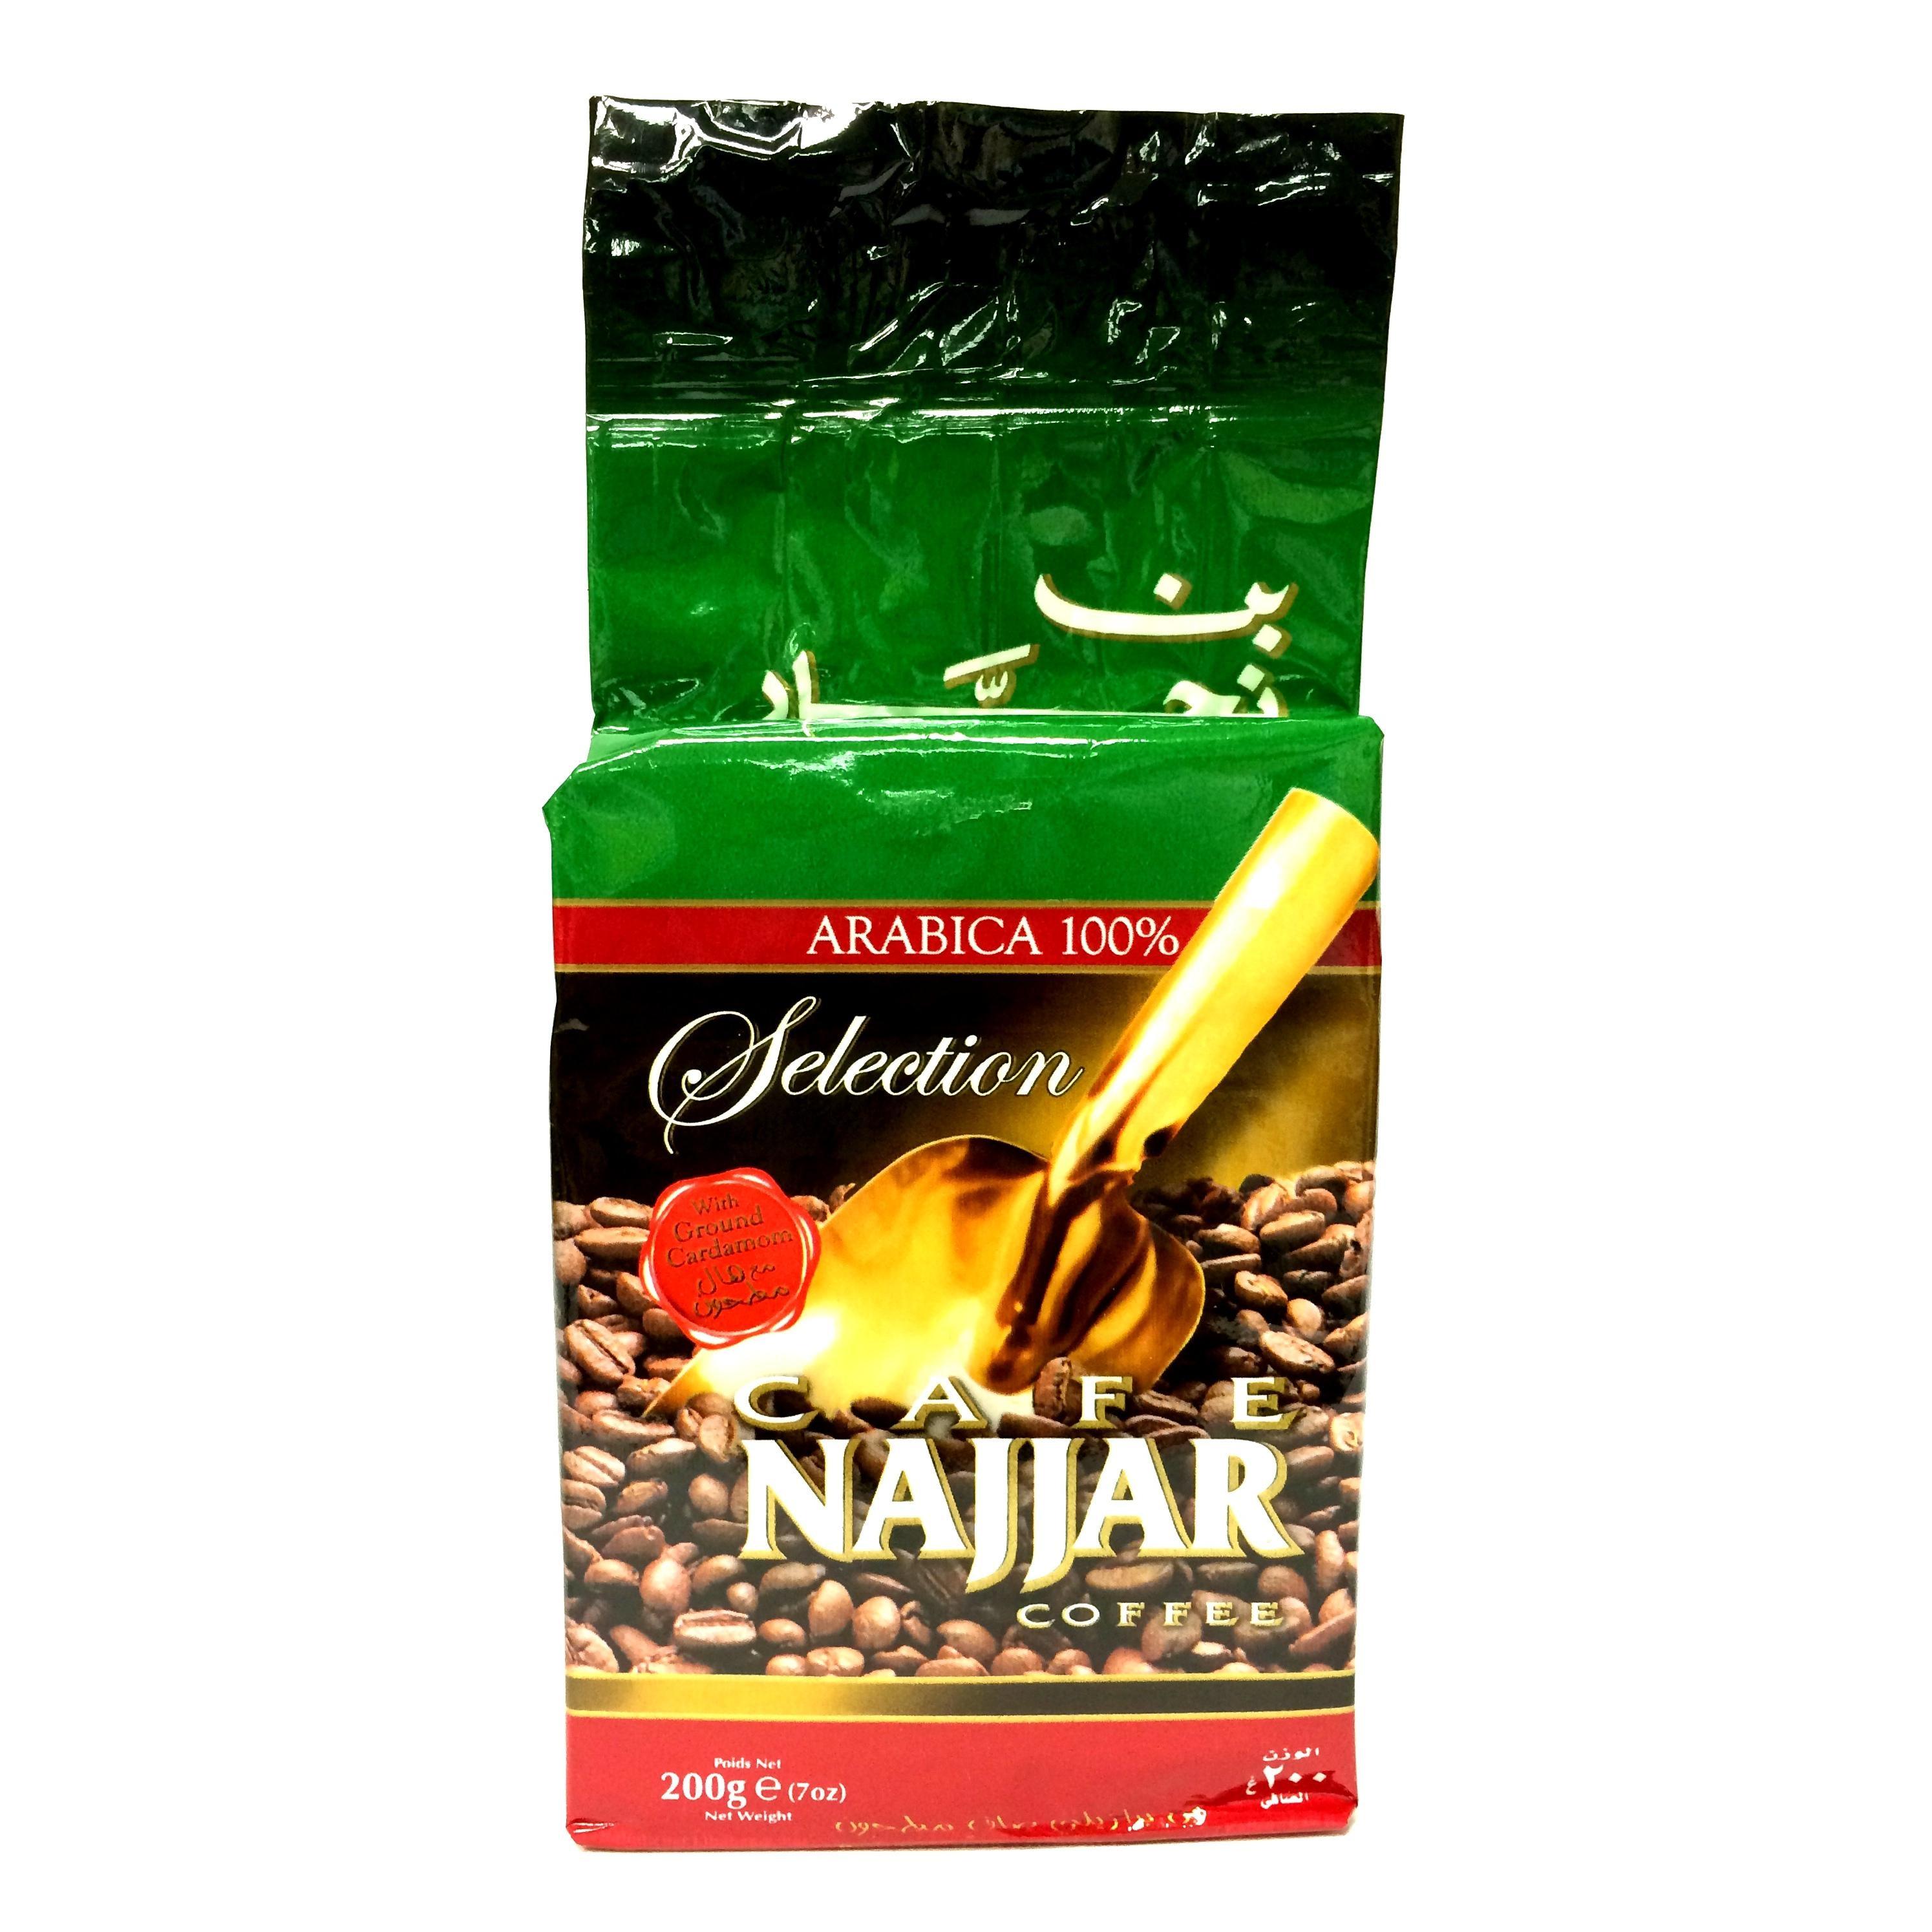 Najjar Arabischer Mokka Kaffee mit Kardamom gemahlen 200g